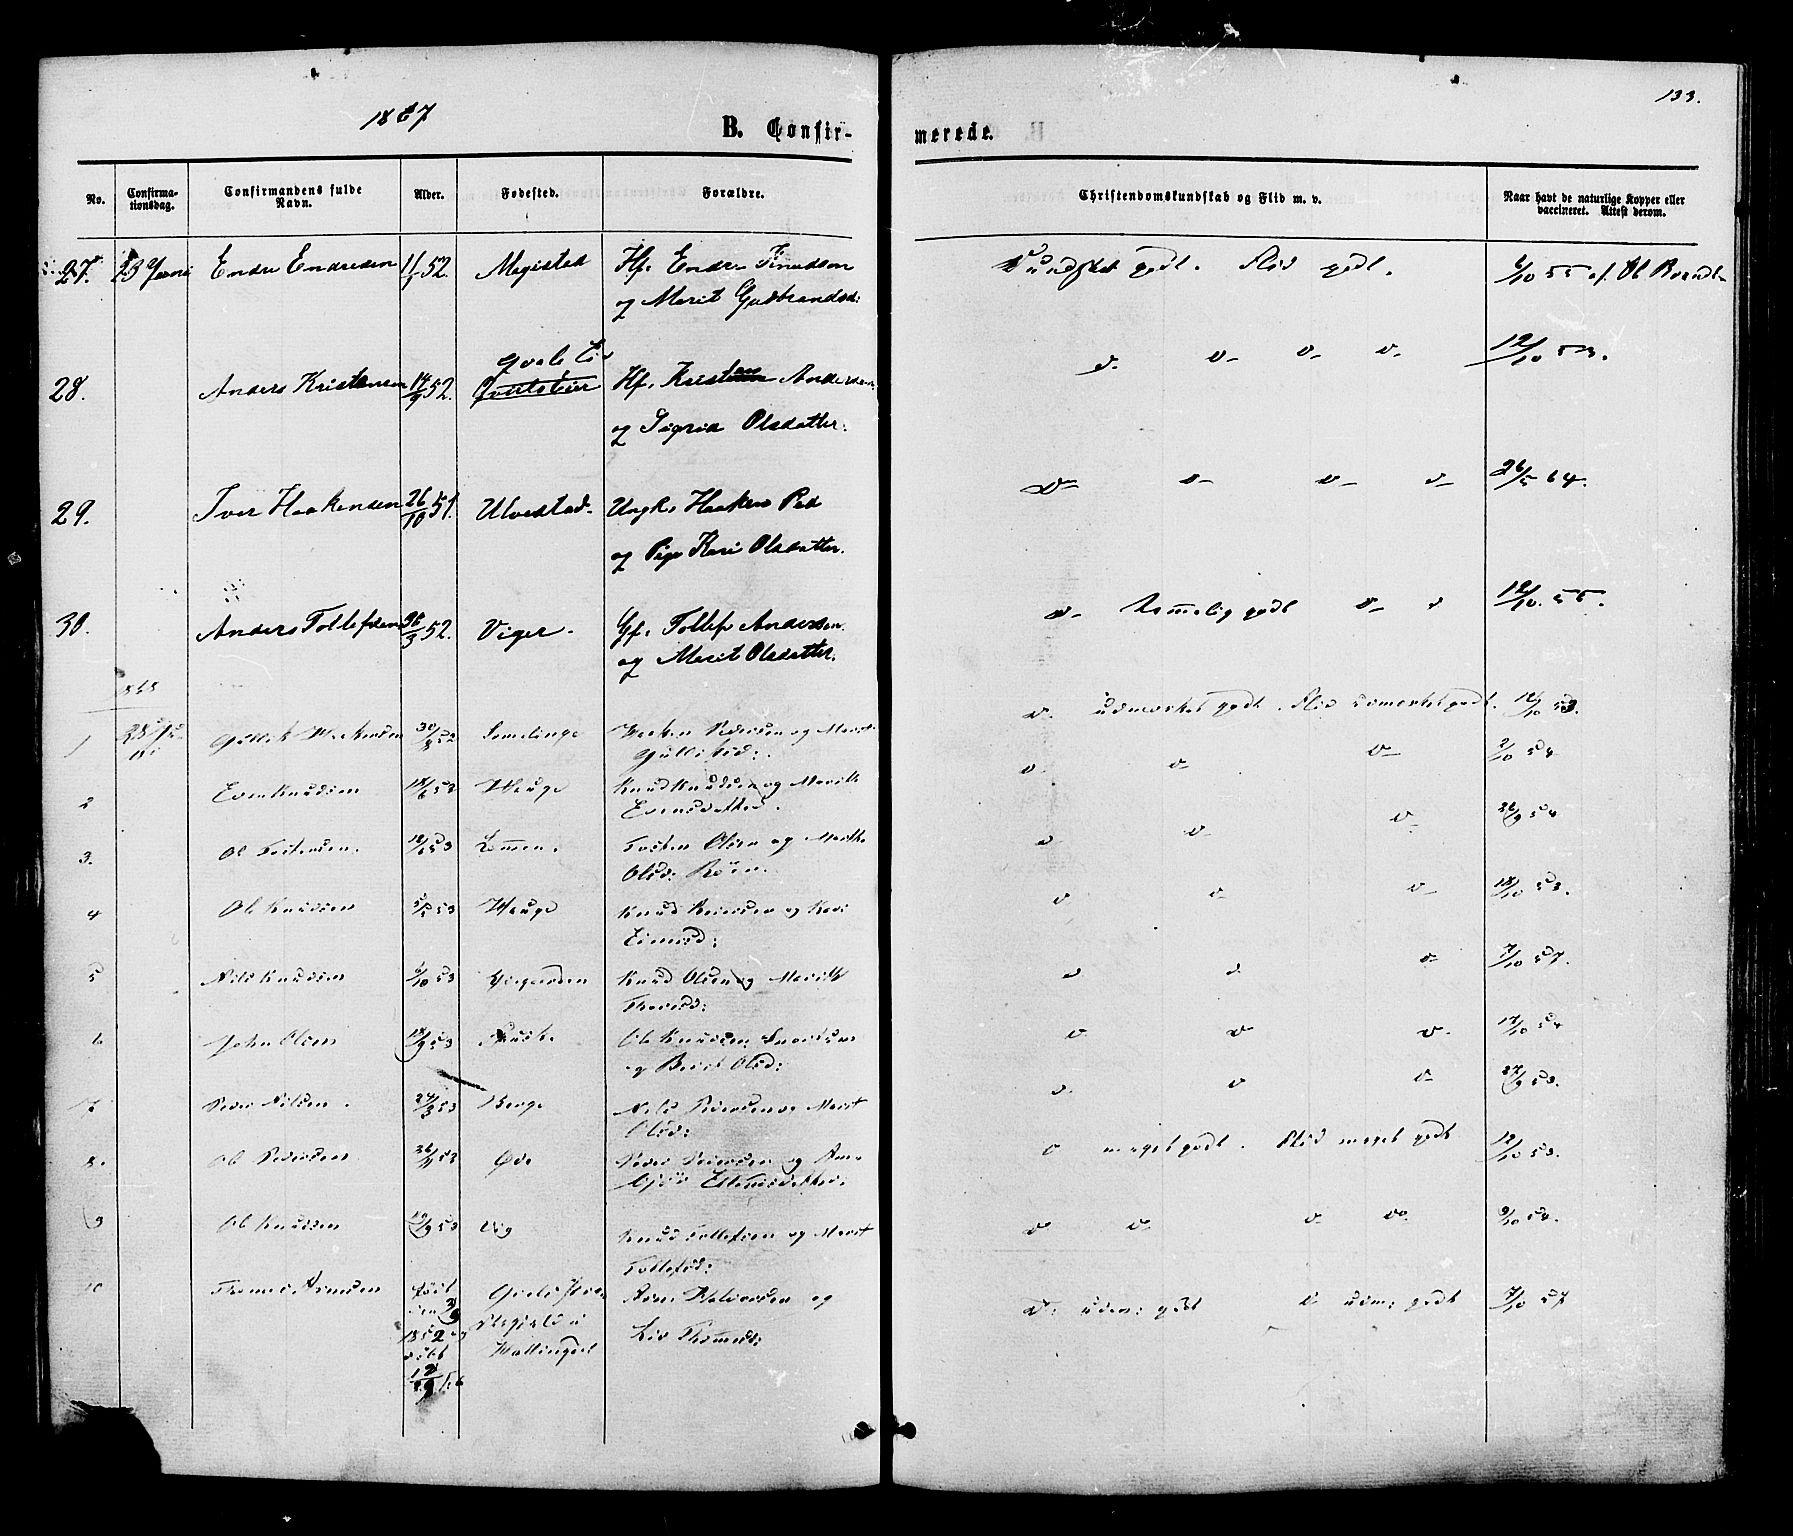 SAH, Vestre Slidre prestekontor, Ministerialbok nr. 3, 1865-1880, s. 133